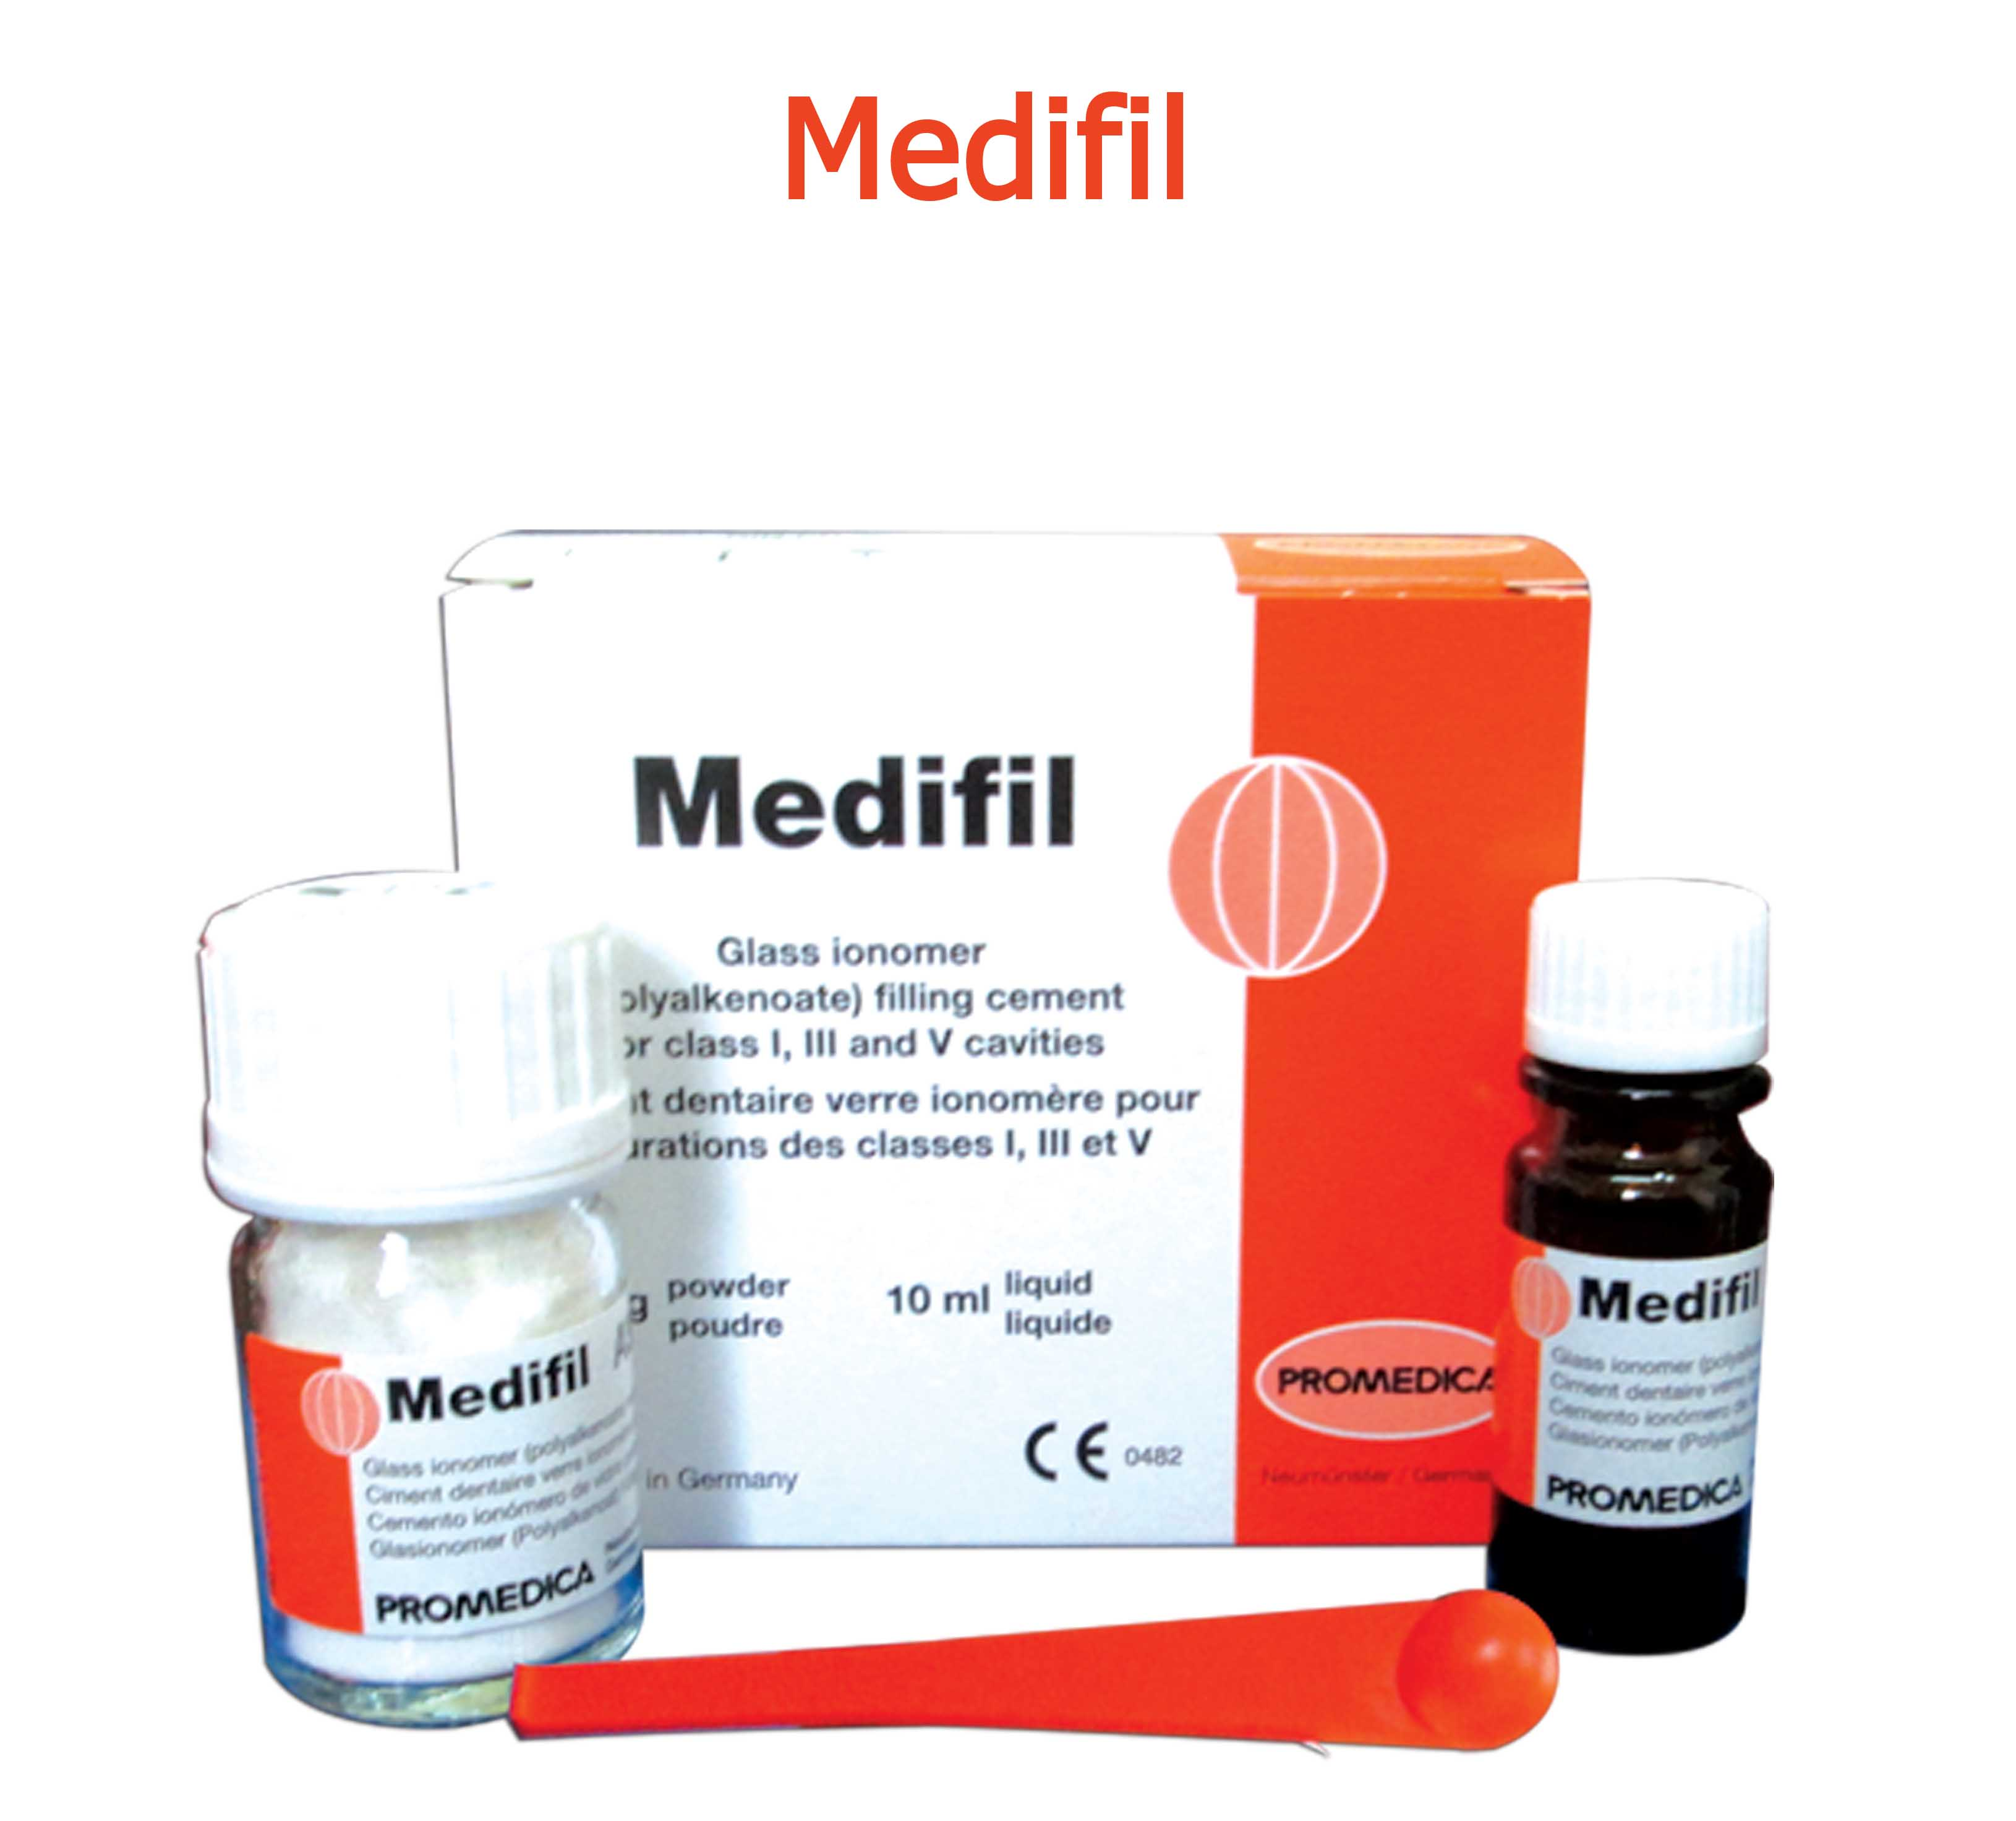 Medifil